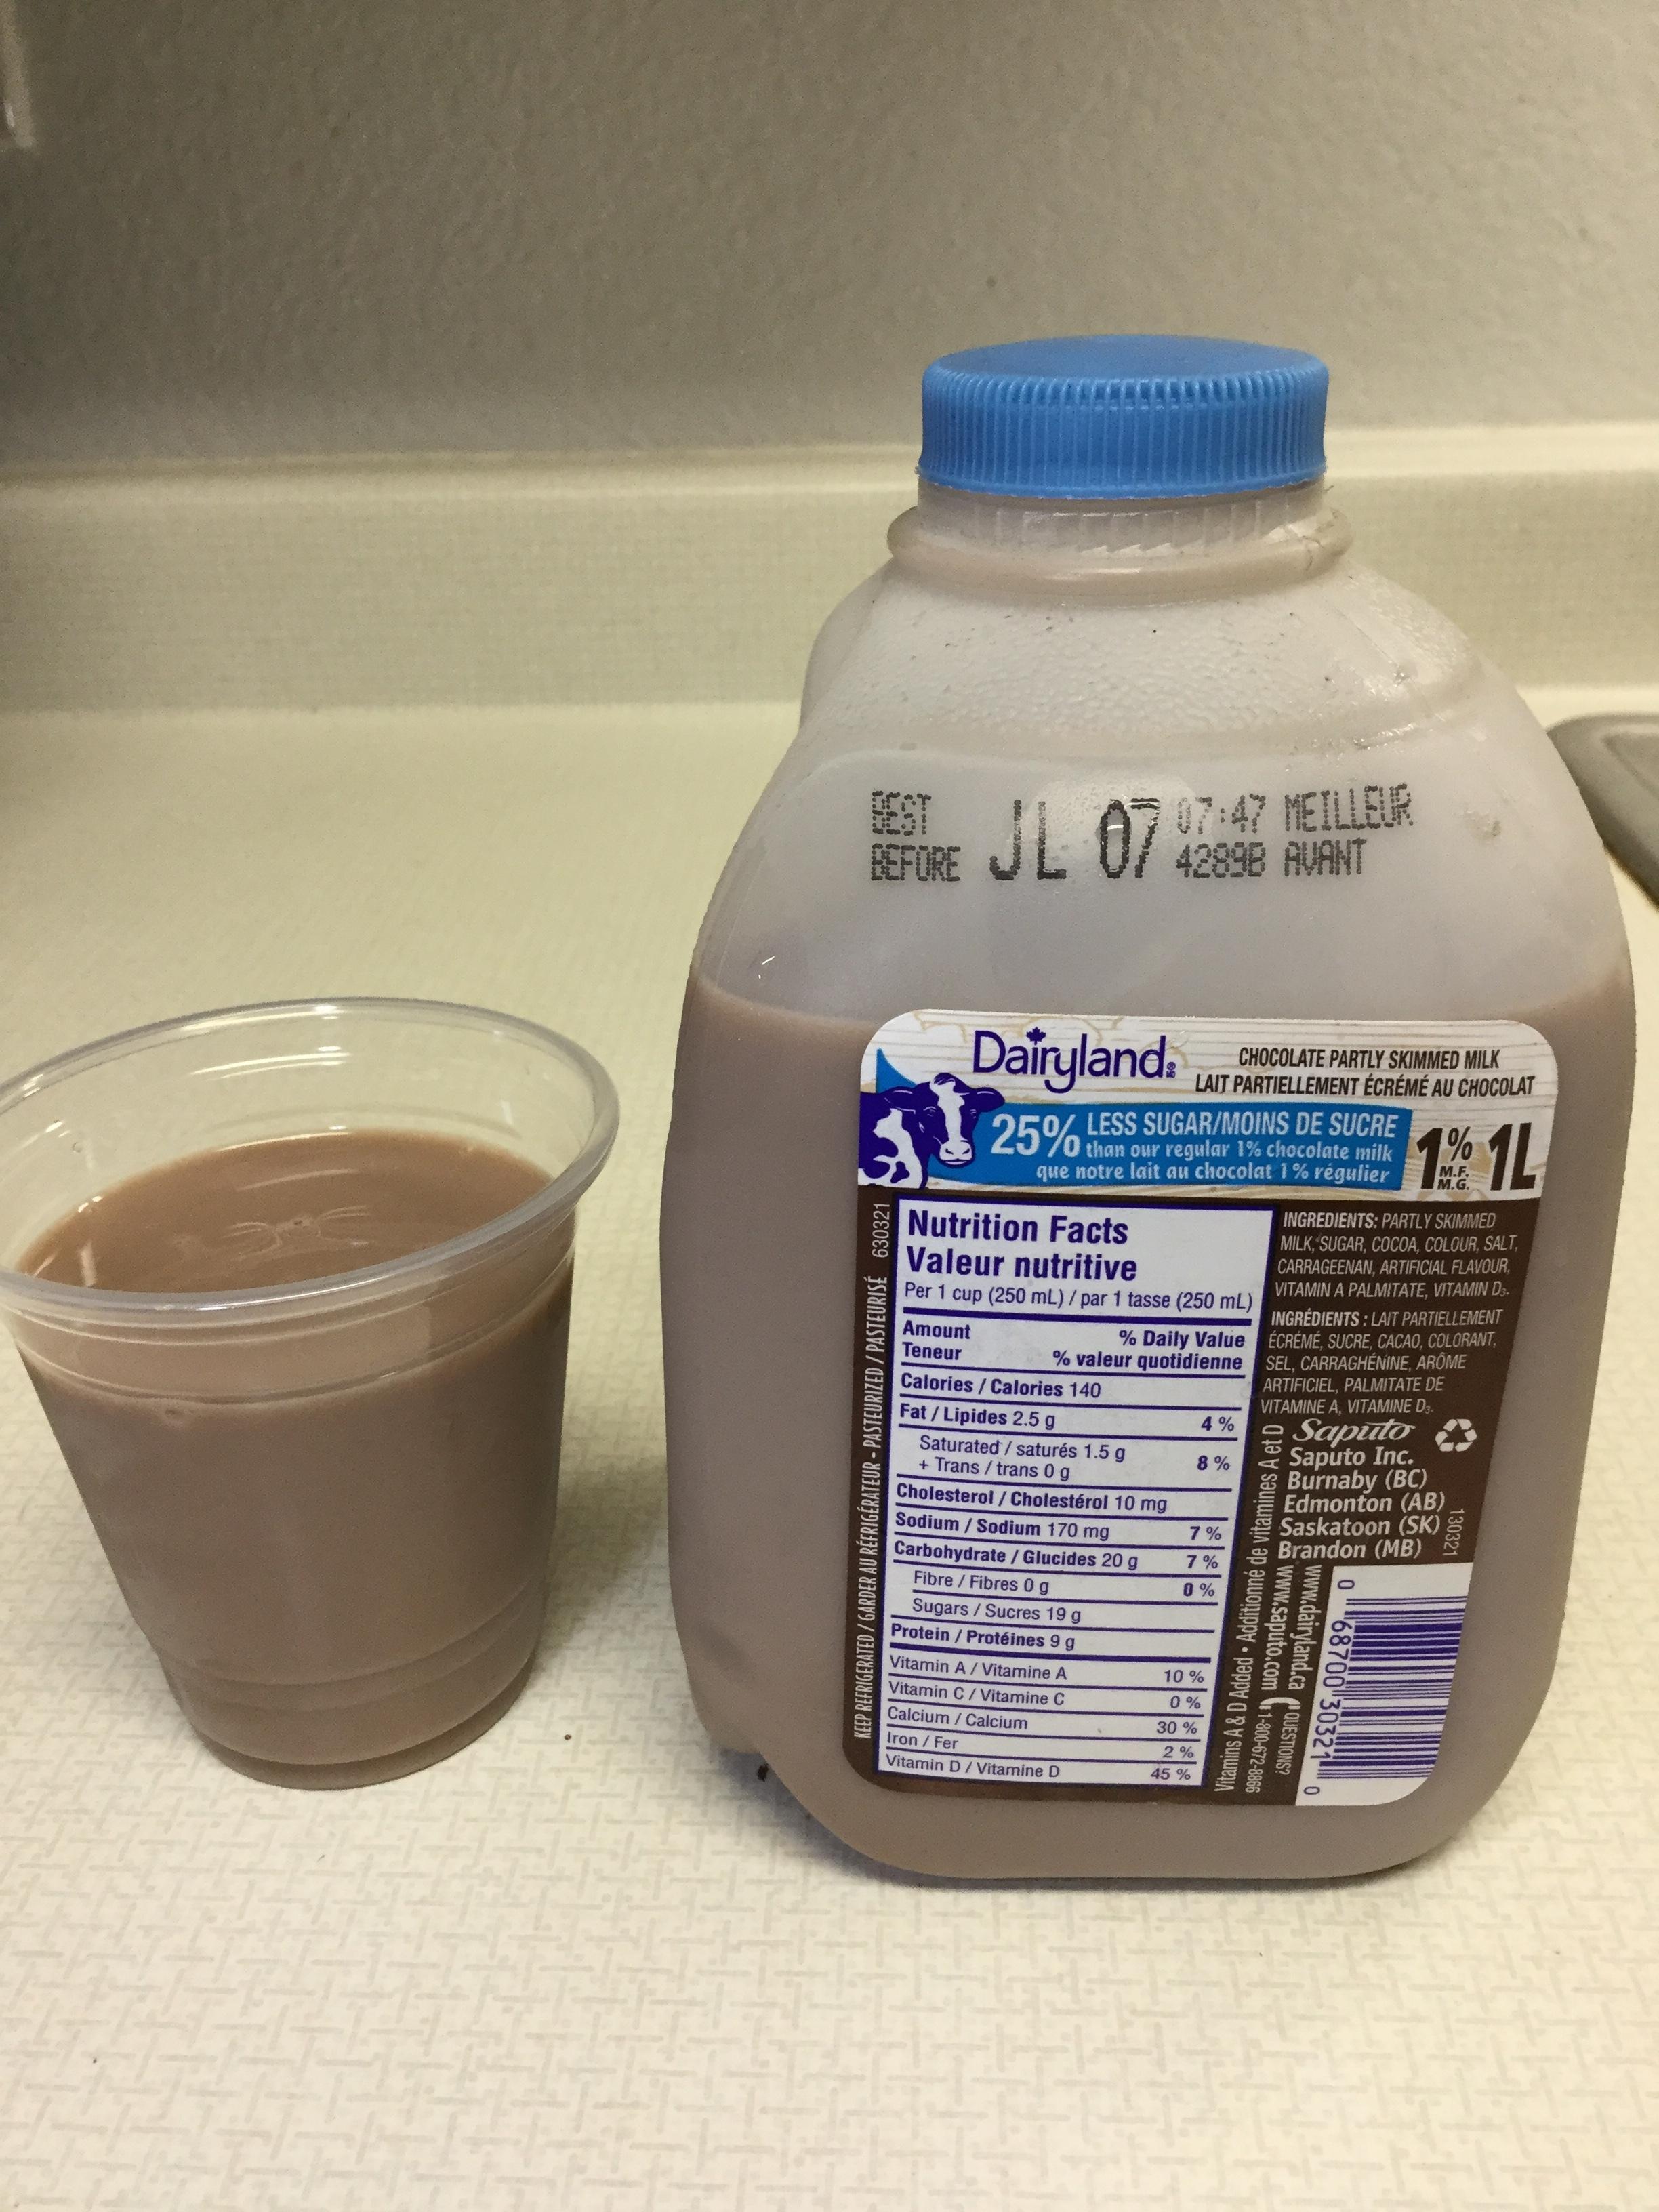 Dairyland Chocolate Partly Skimmed Milk 25% Less Sugar Cup